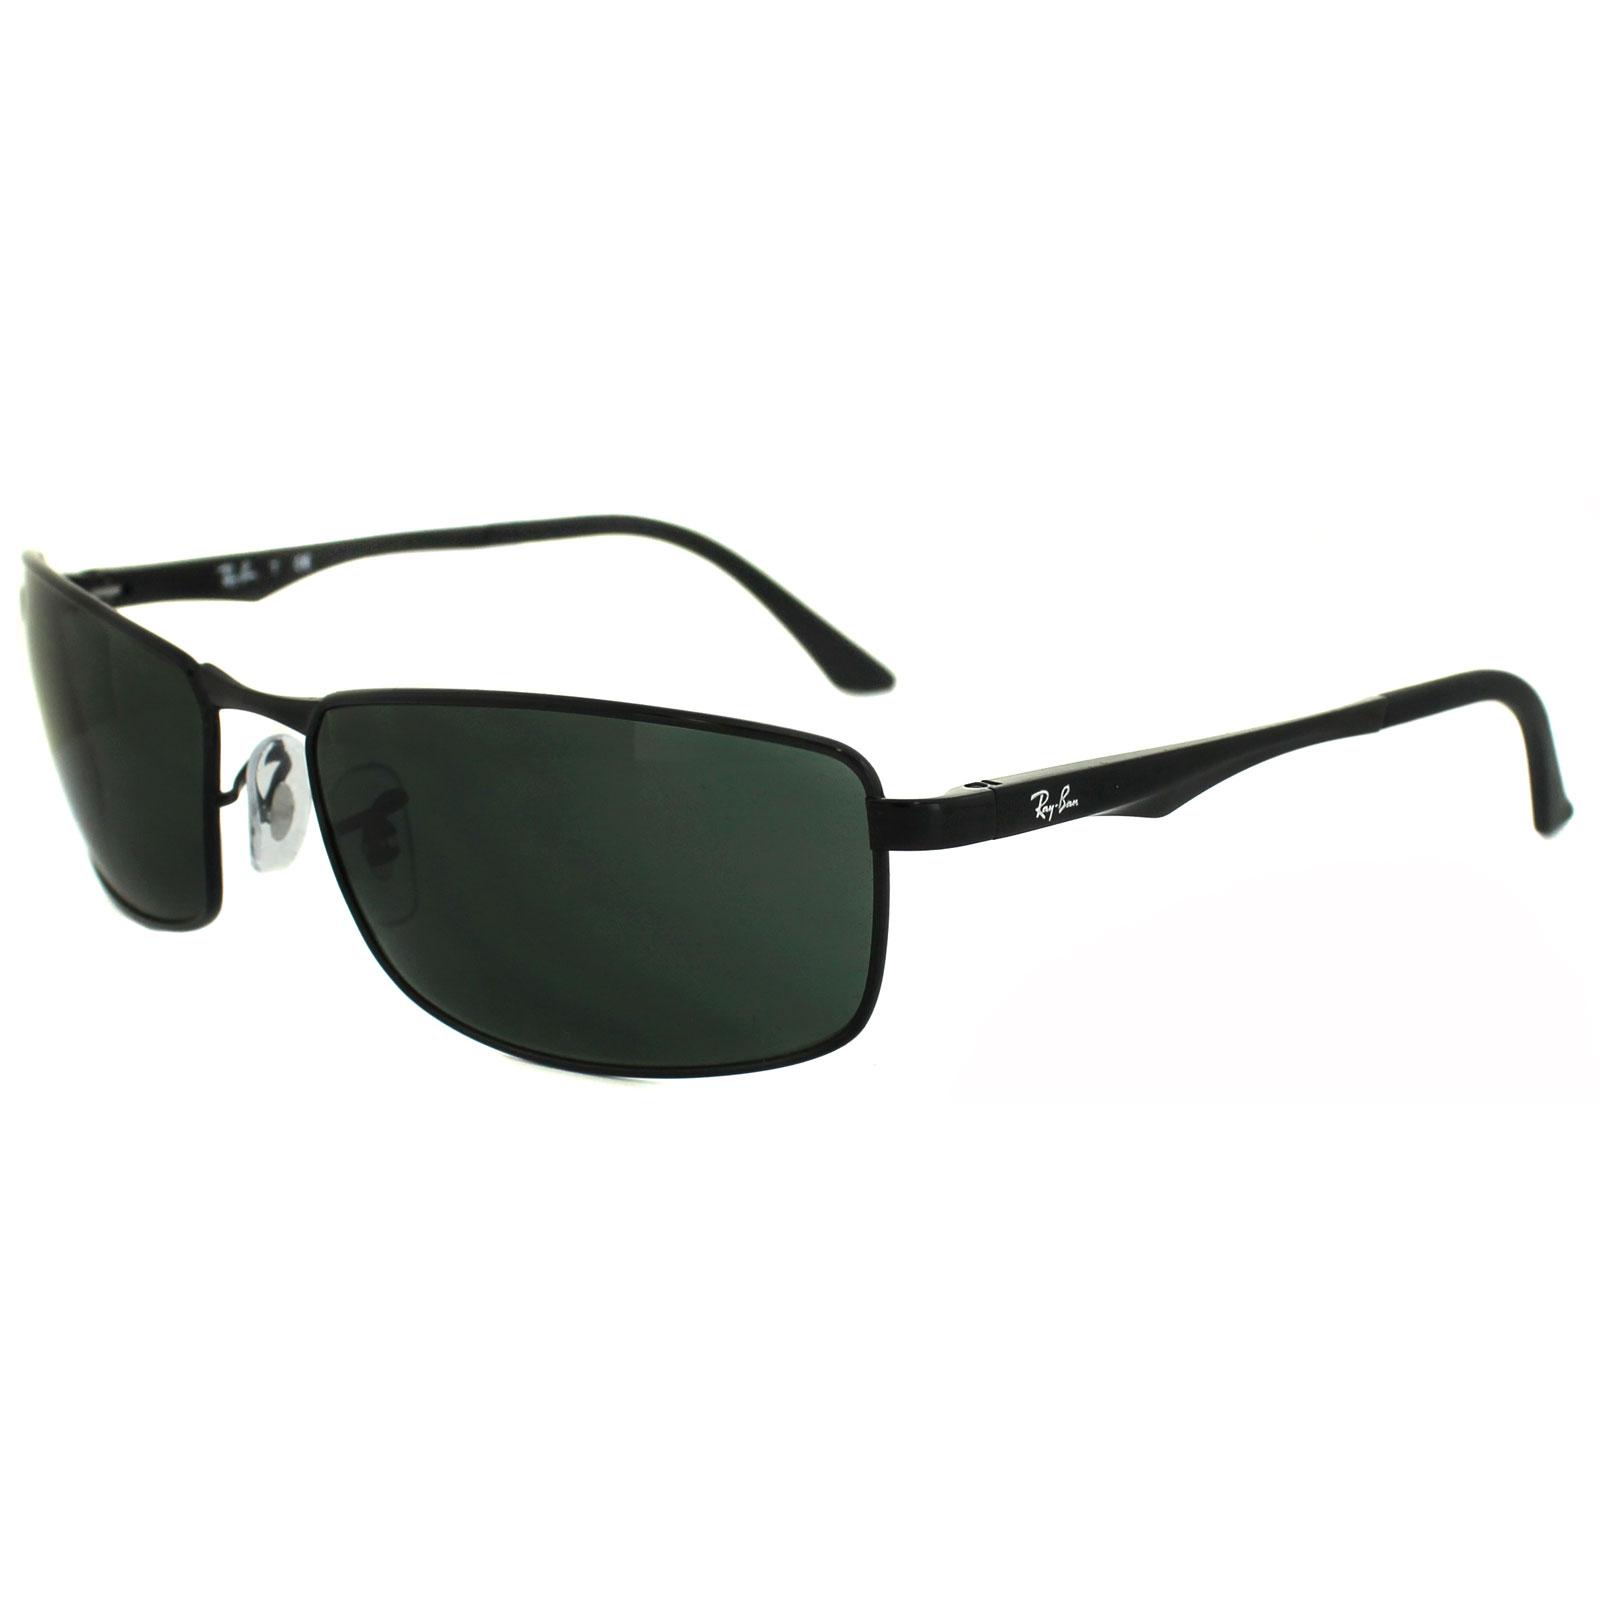 dae8426e21 ... best price sentinel rayban sunglasses 3498 002 71 black green 6208b  4e6d8